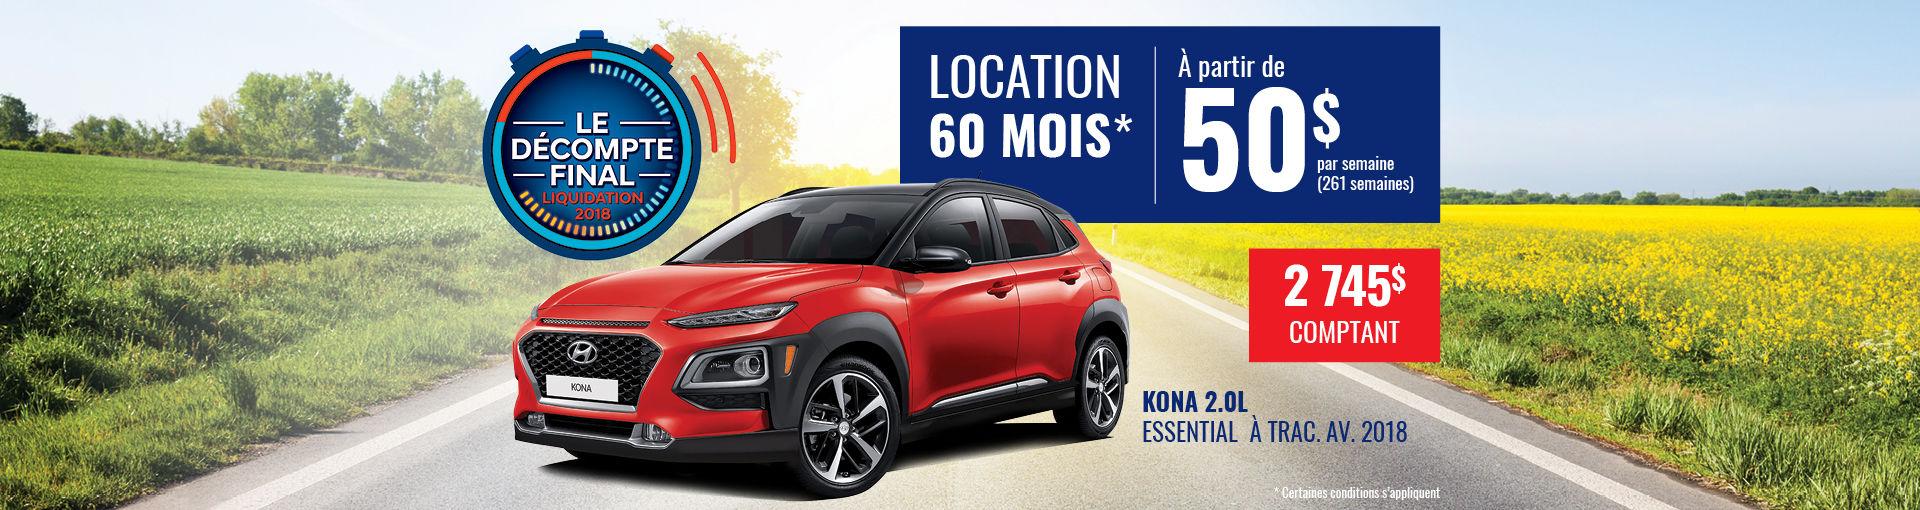 Promo Hyundai Casavant août 2018-Kona 2018 pc